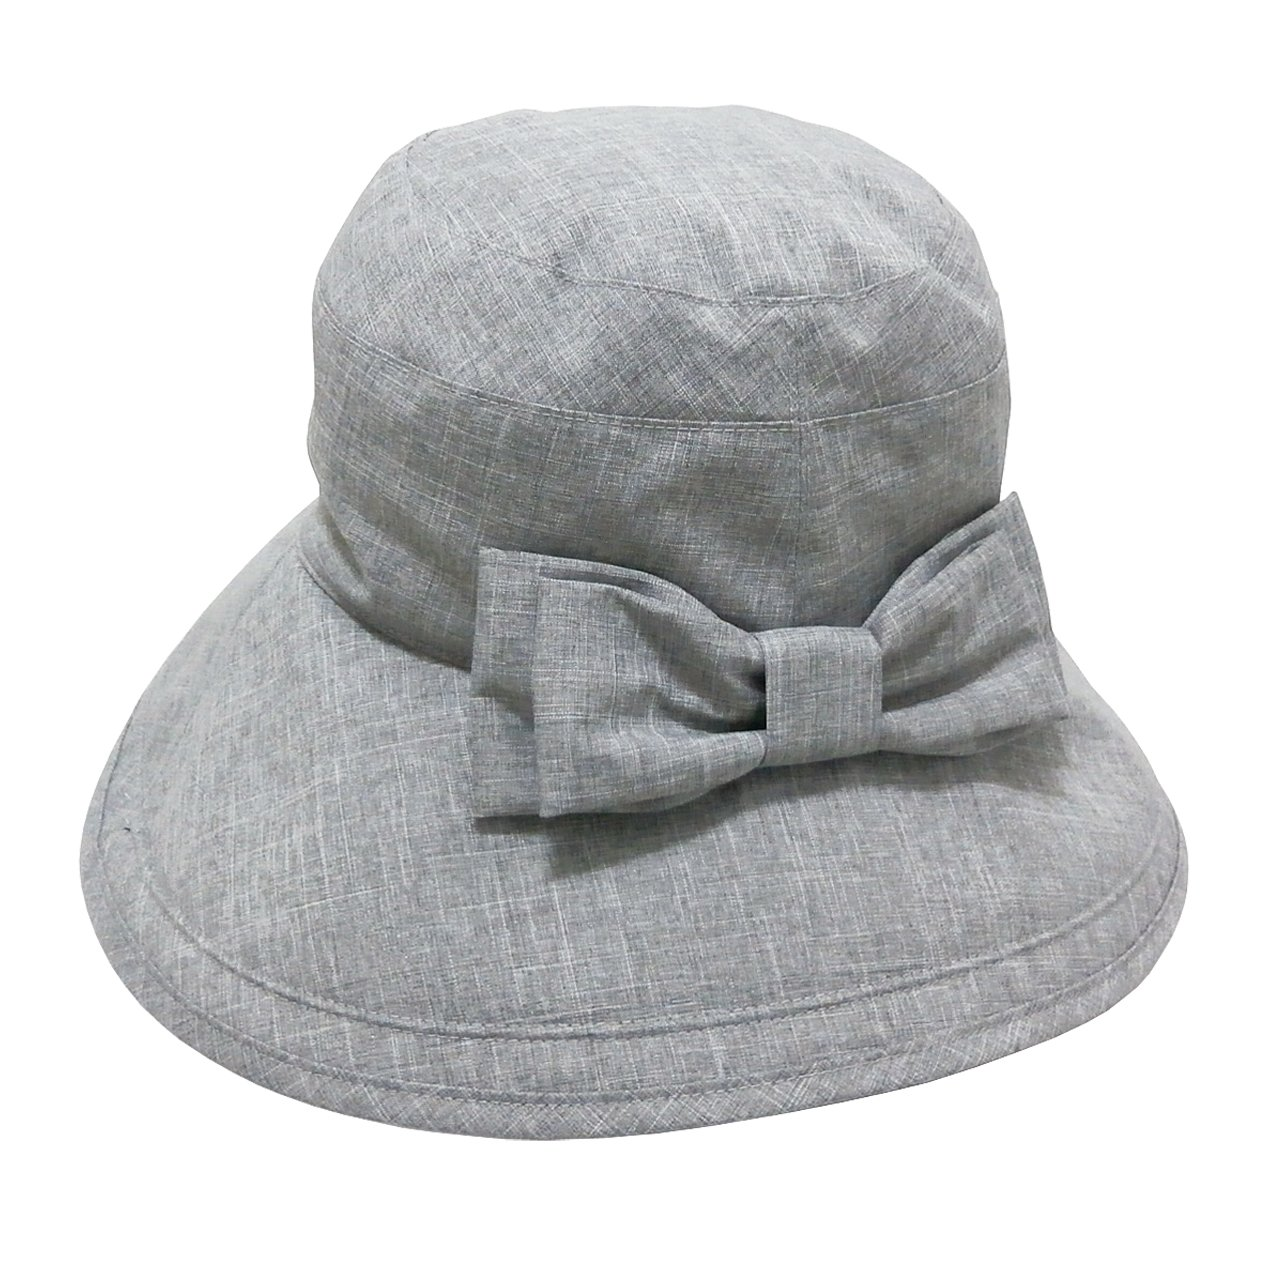 Rose Blanc(ロサブラン) 100%完全遮光 帽子 リボンハット13cm ダンガリー(ポケット付) B01EUBIBM8  ダンガリーグレー